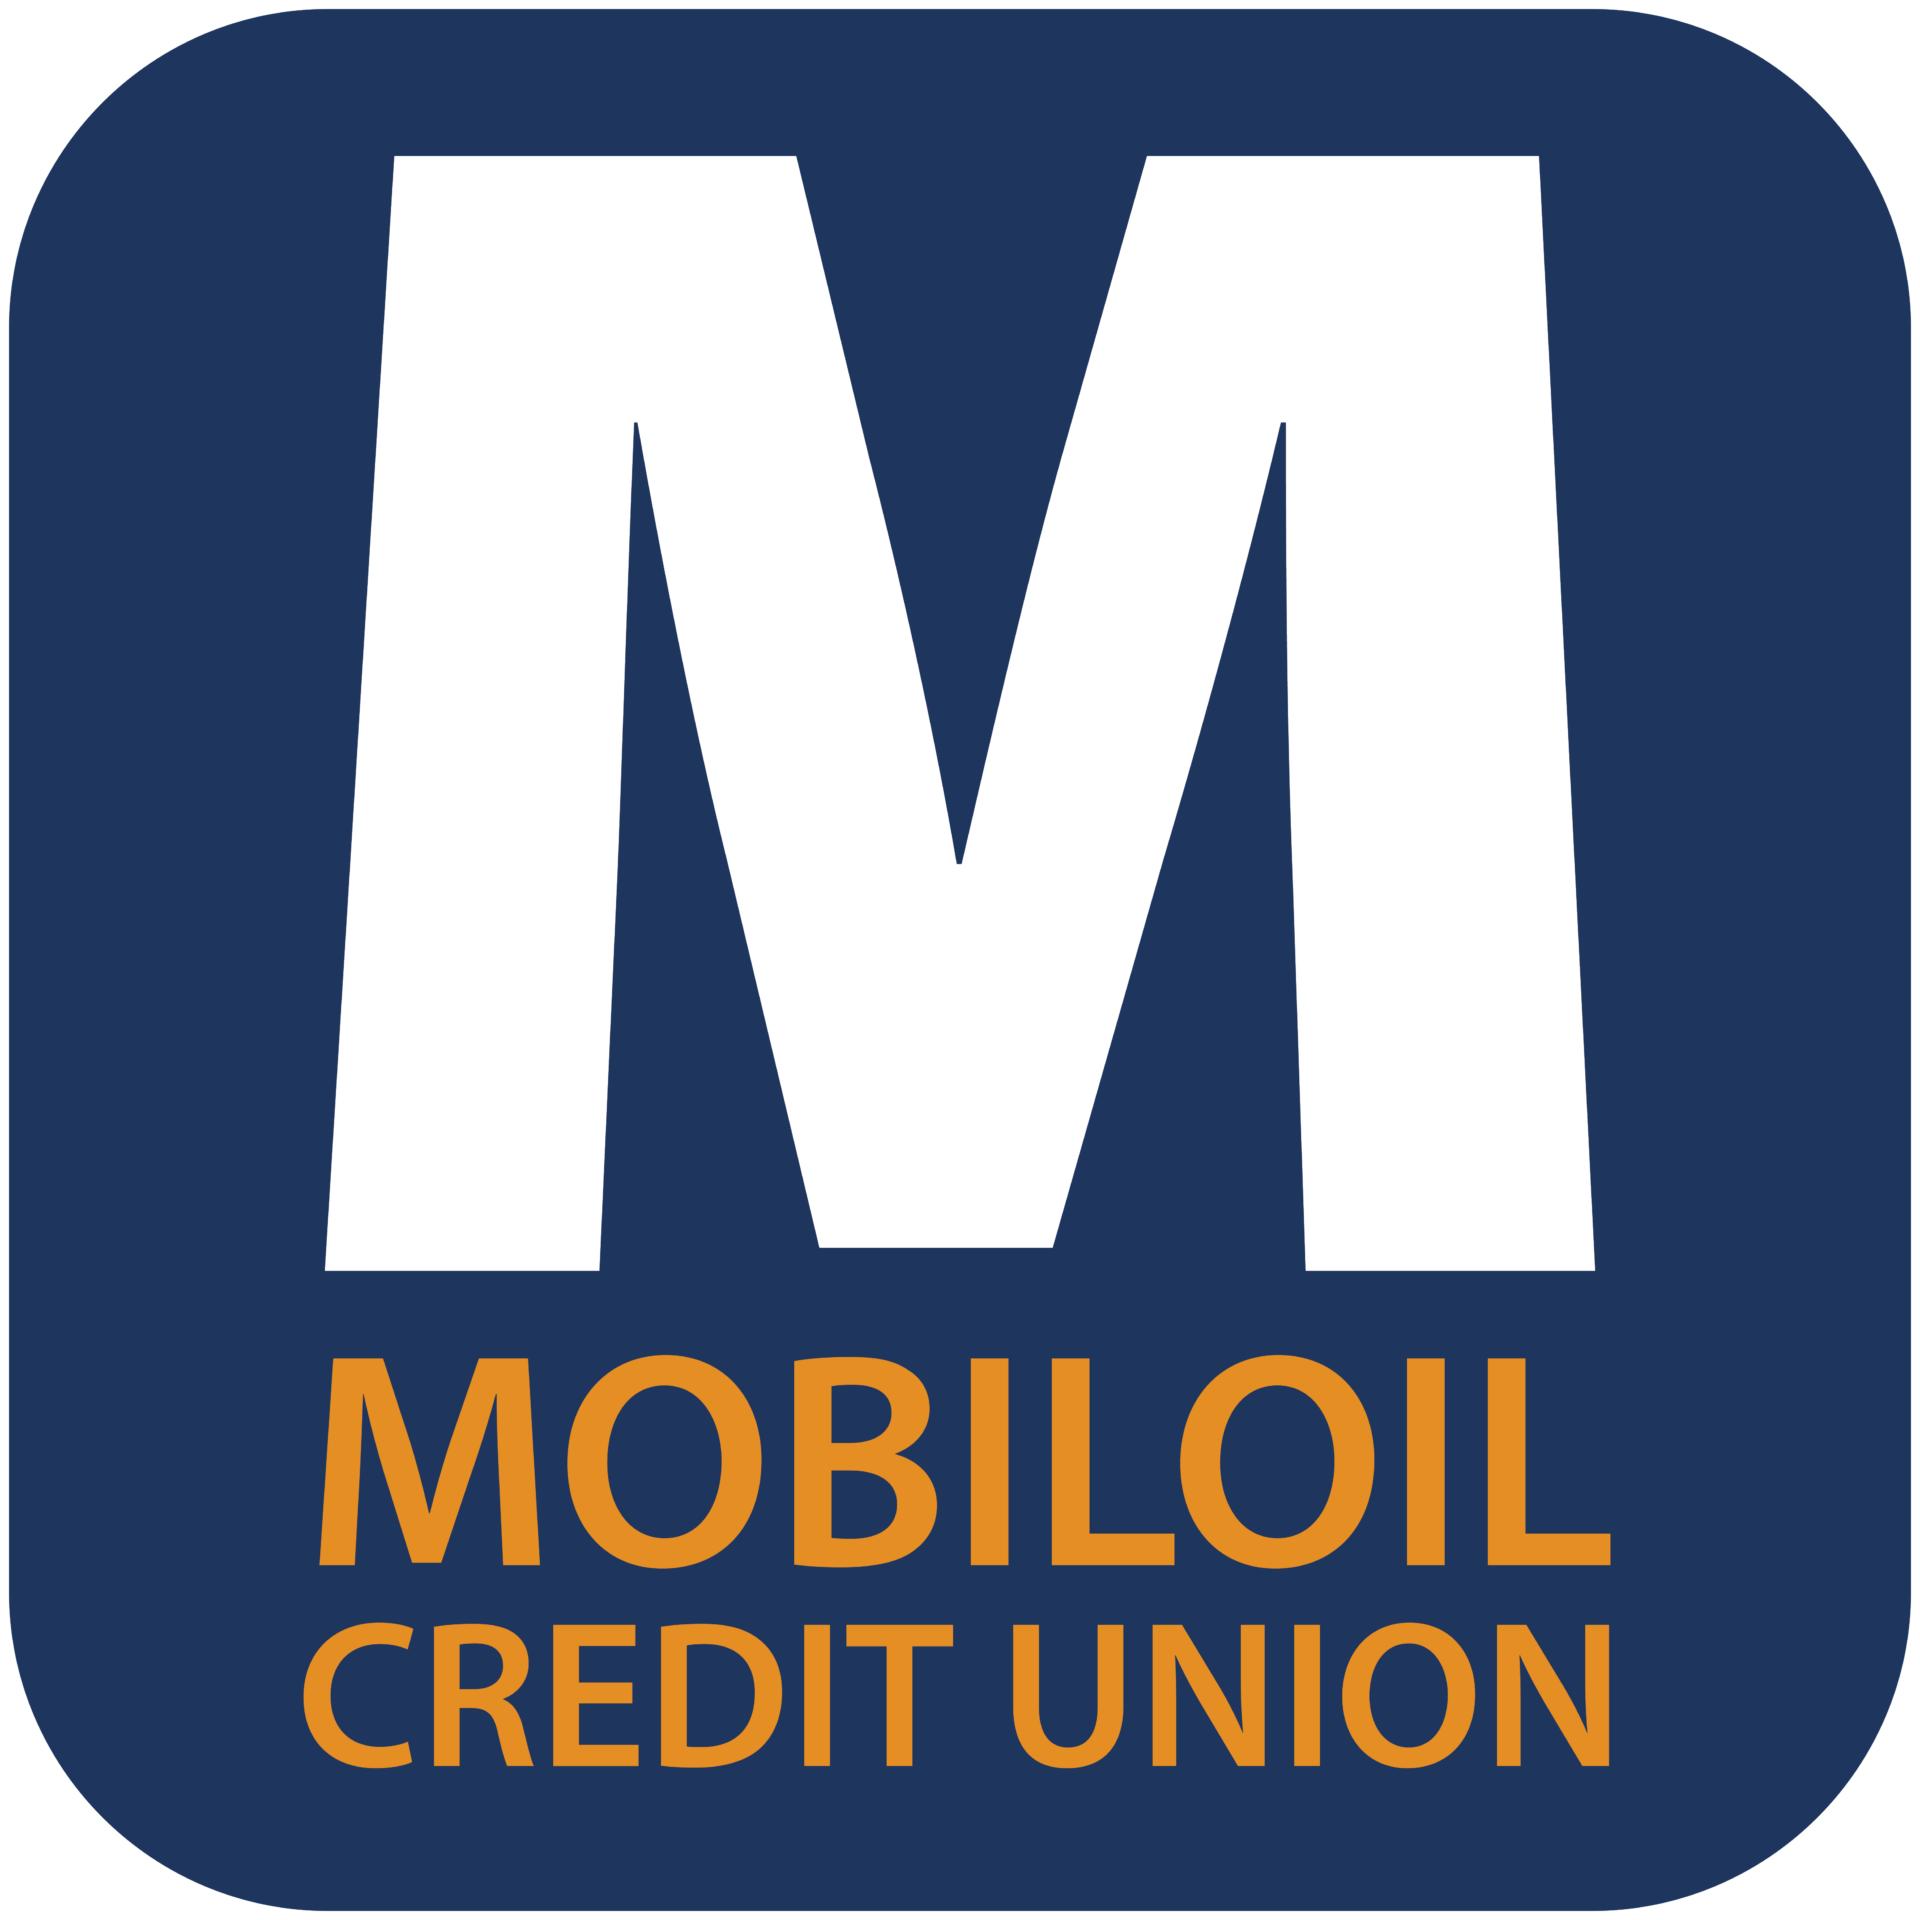 Mobiloil CU APP Logo Rounded